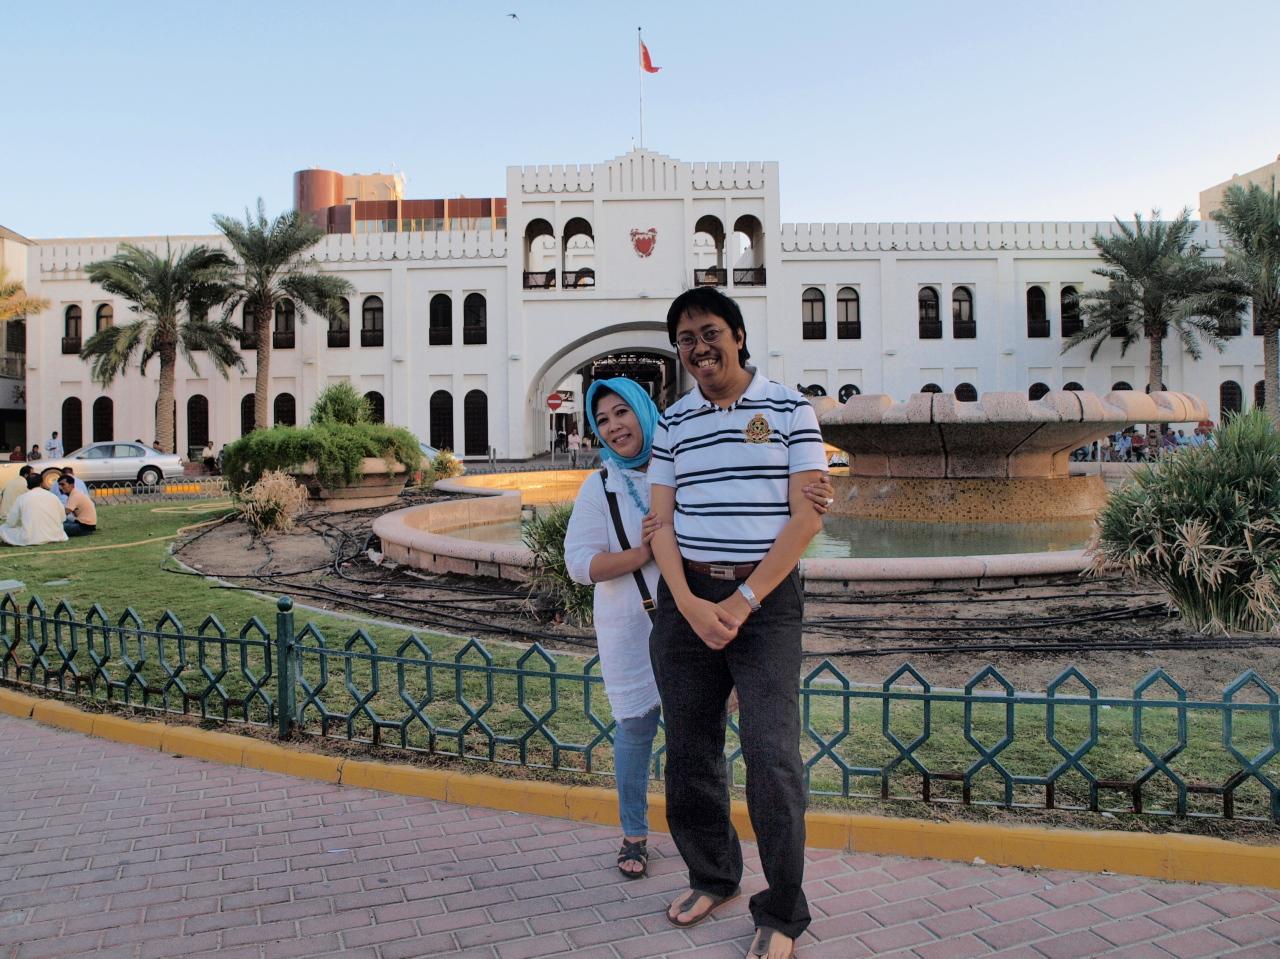 Wisata forex dan bahrain pariwisata